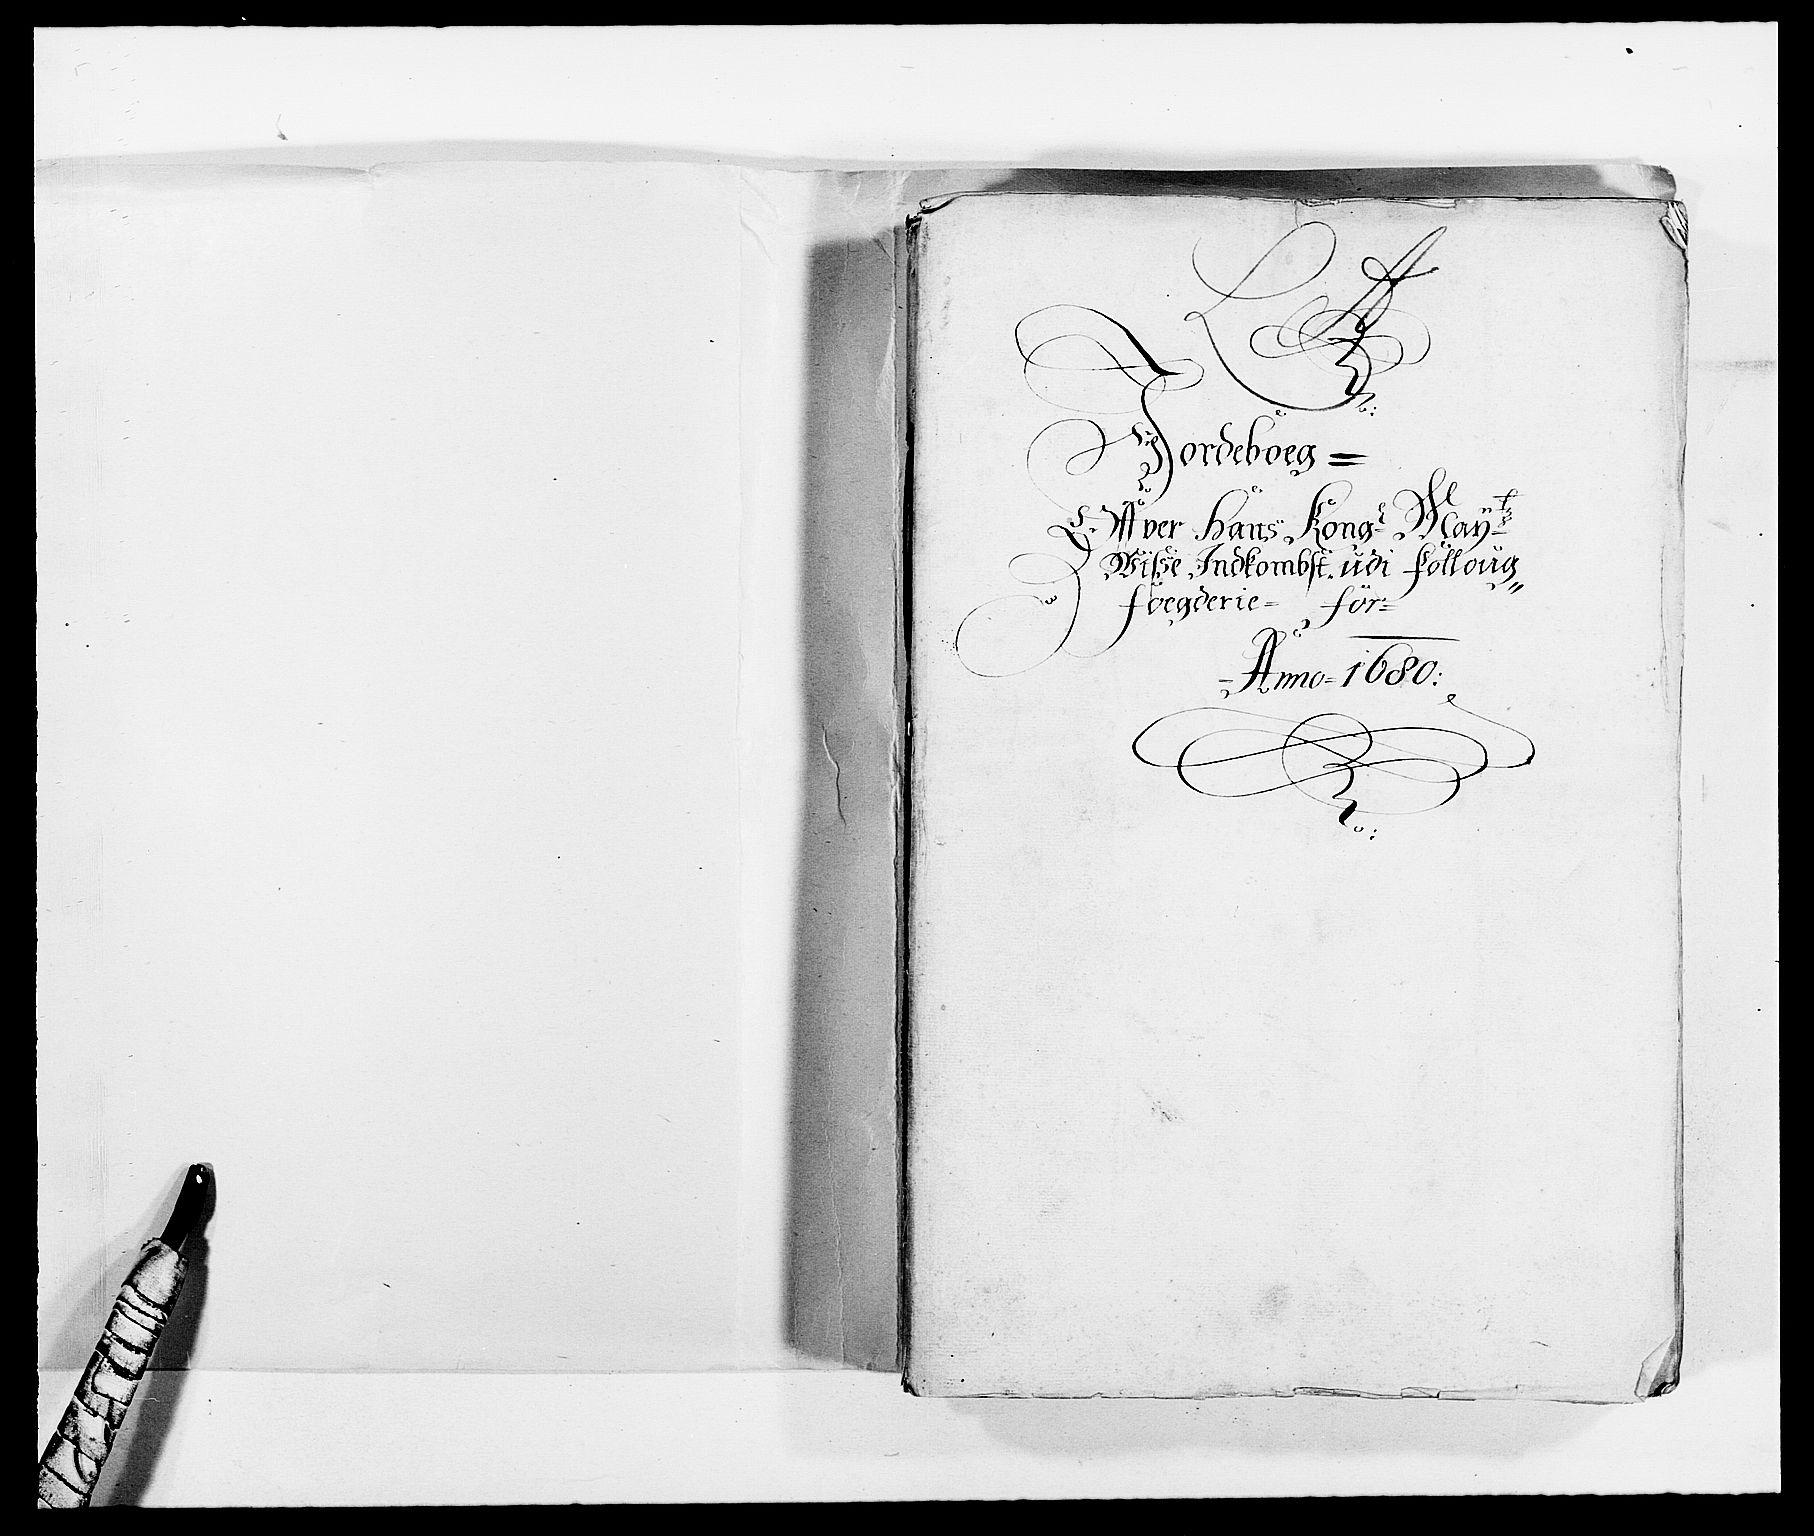 RA, Rentekammeret inntil 1814, Reviderte regnskaper, Fogderegnskap, R09/L0429: Fogderegnskap Follo, 1680-1681, s. 2